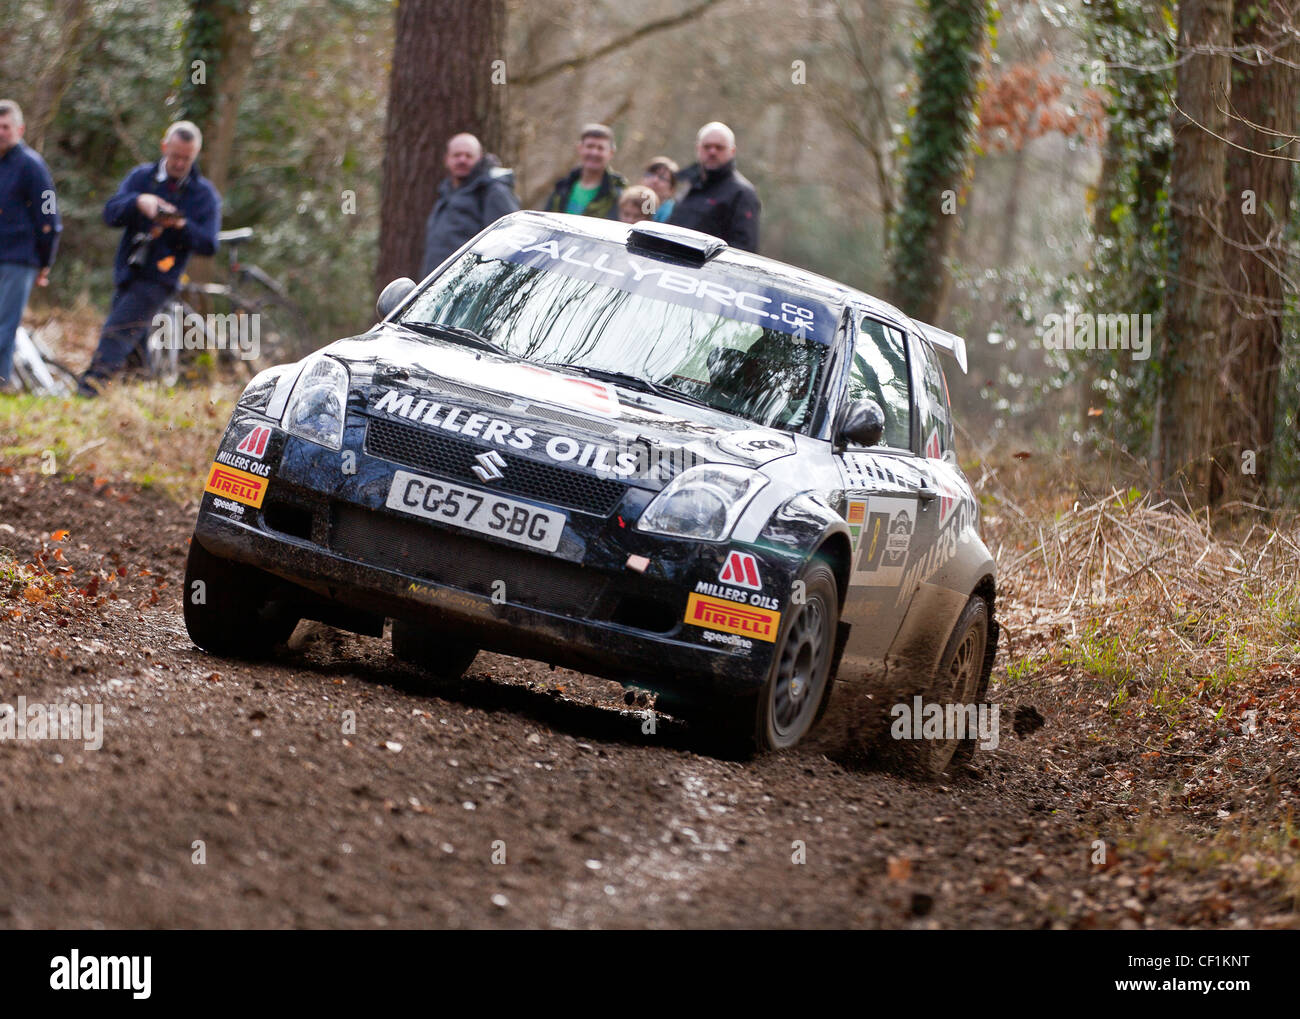 Callum Black in a ex works Suzuki Swift S1600 at the Rally